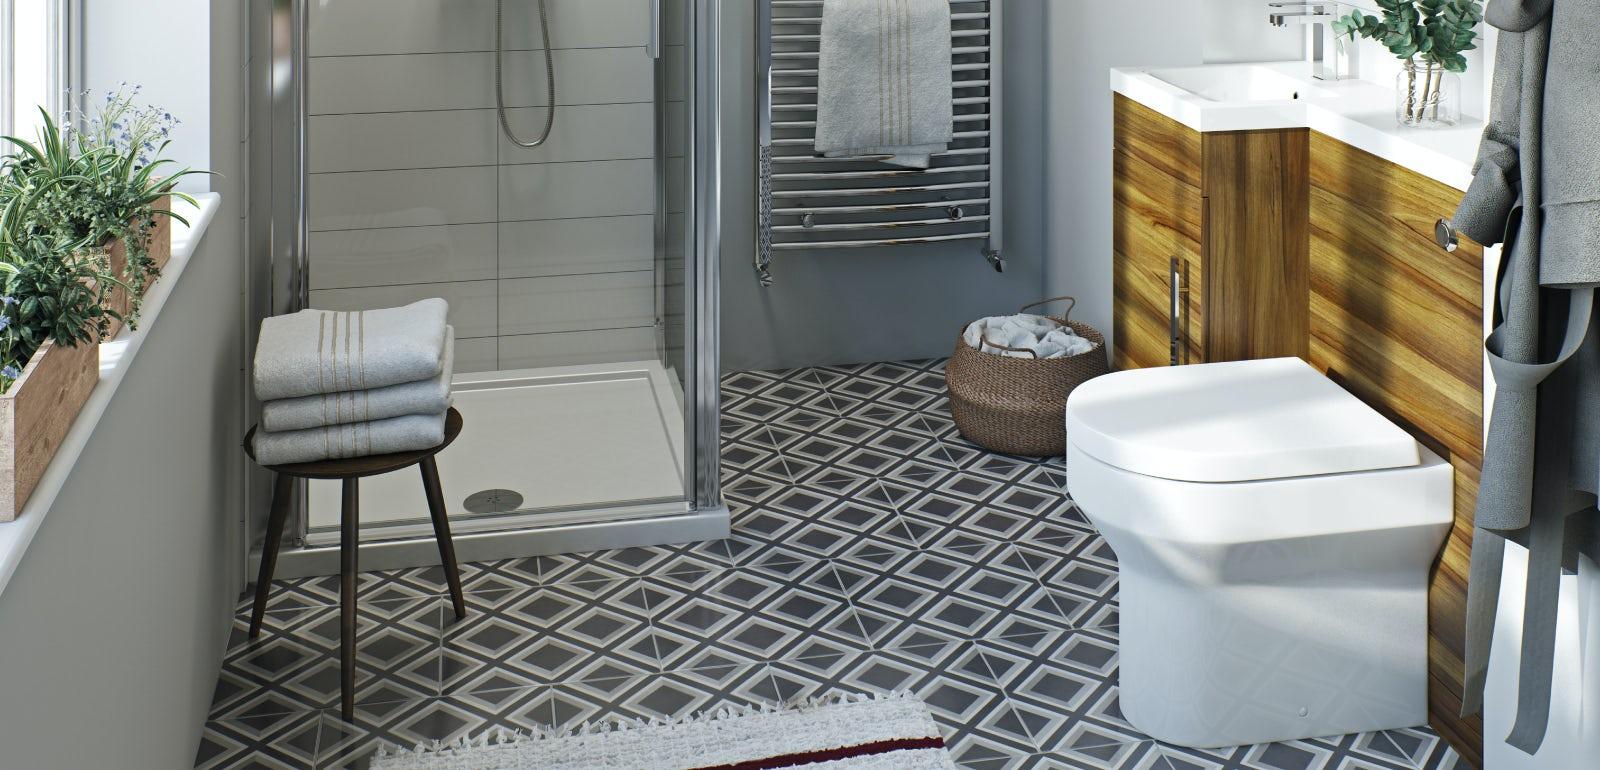 & Clever small toilet ideas | VictoriaPlum.com